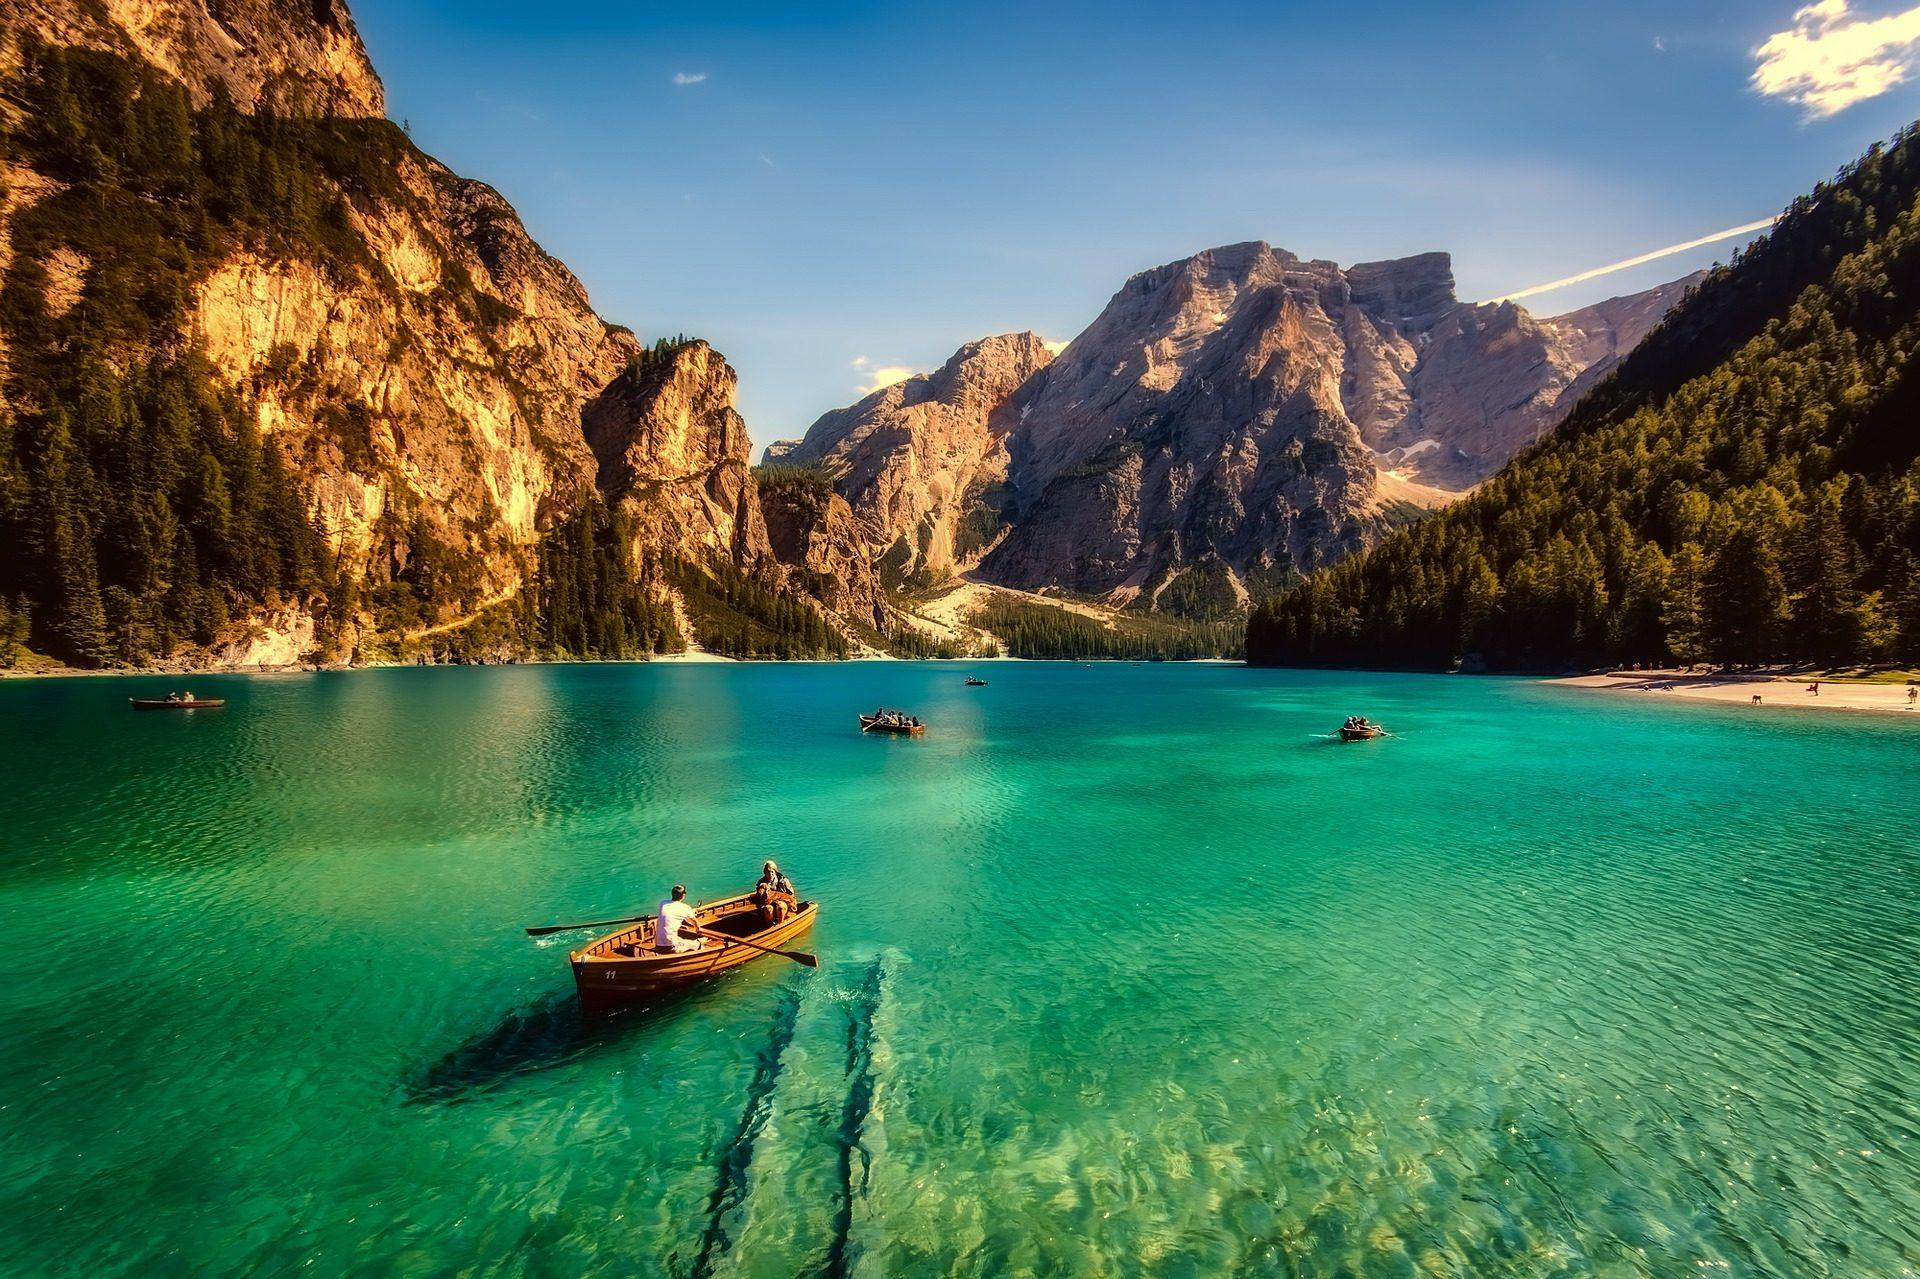 नौकाओं, झील, सागर, पानी, मरकत - HD वॉलपेपर - प्रोफेसर-falken.com